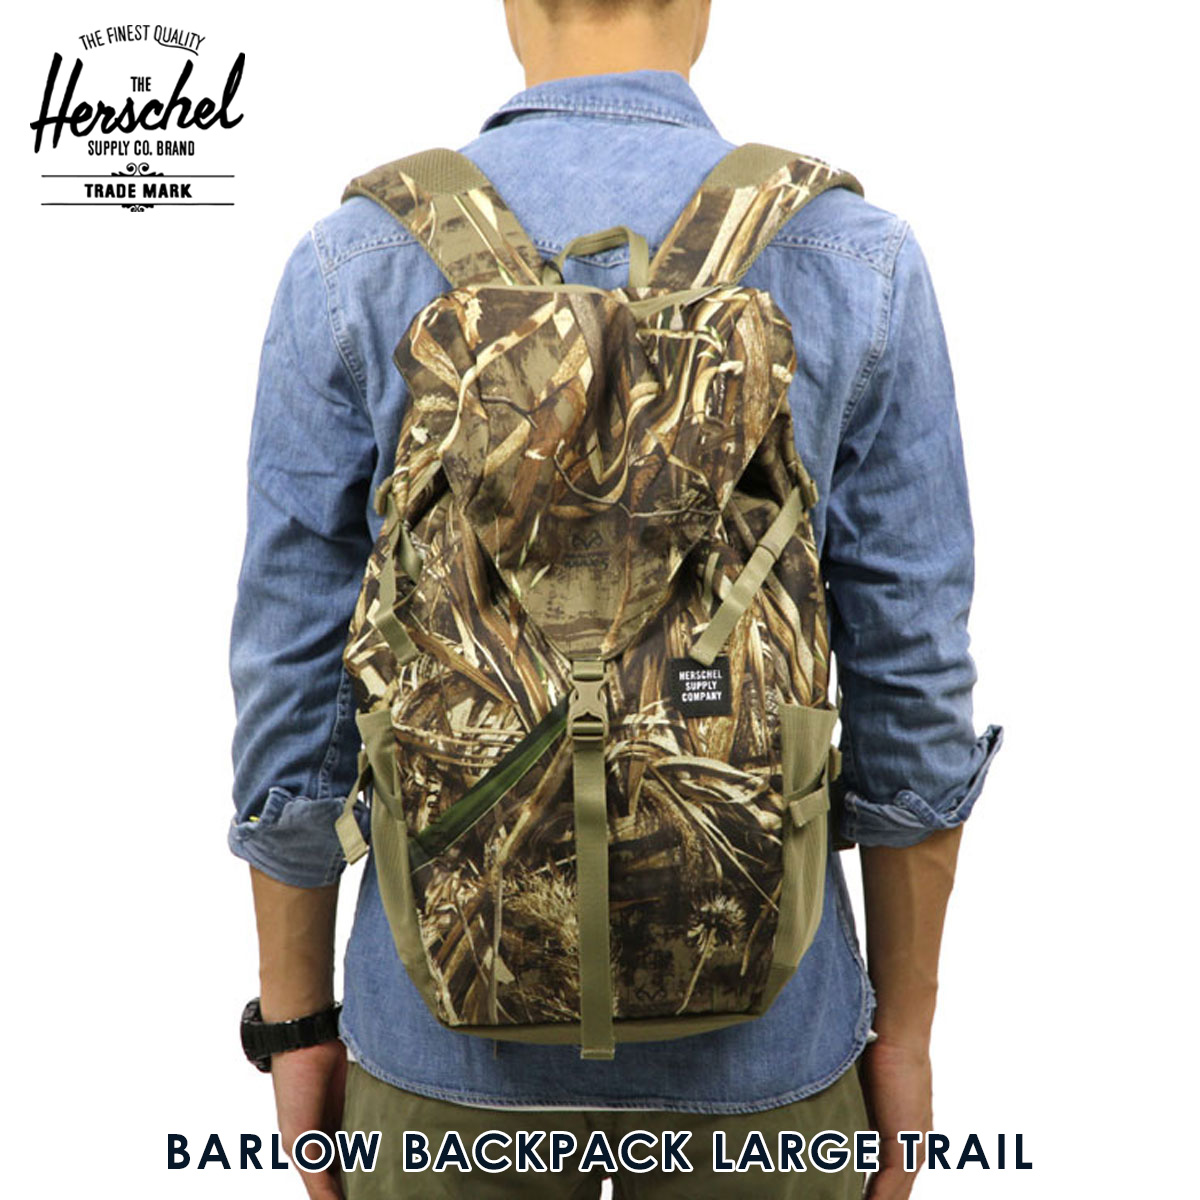 8aa6d08cd23 Hershel supply Herschel Supply regular store bag BARLOW BACKPACK LARGE TRAIL  10319-01454-OS REALTREE D00S15